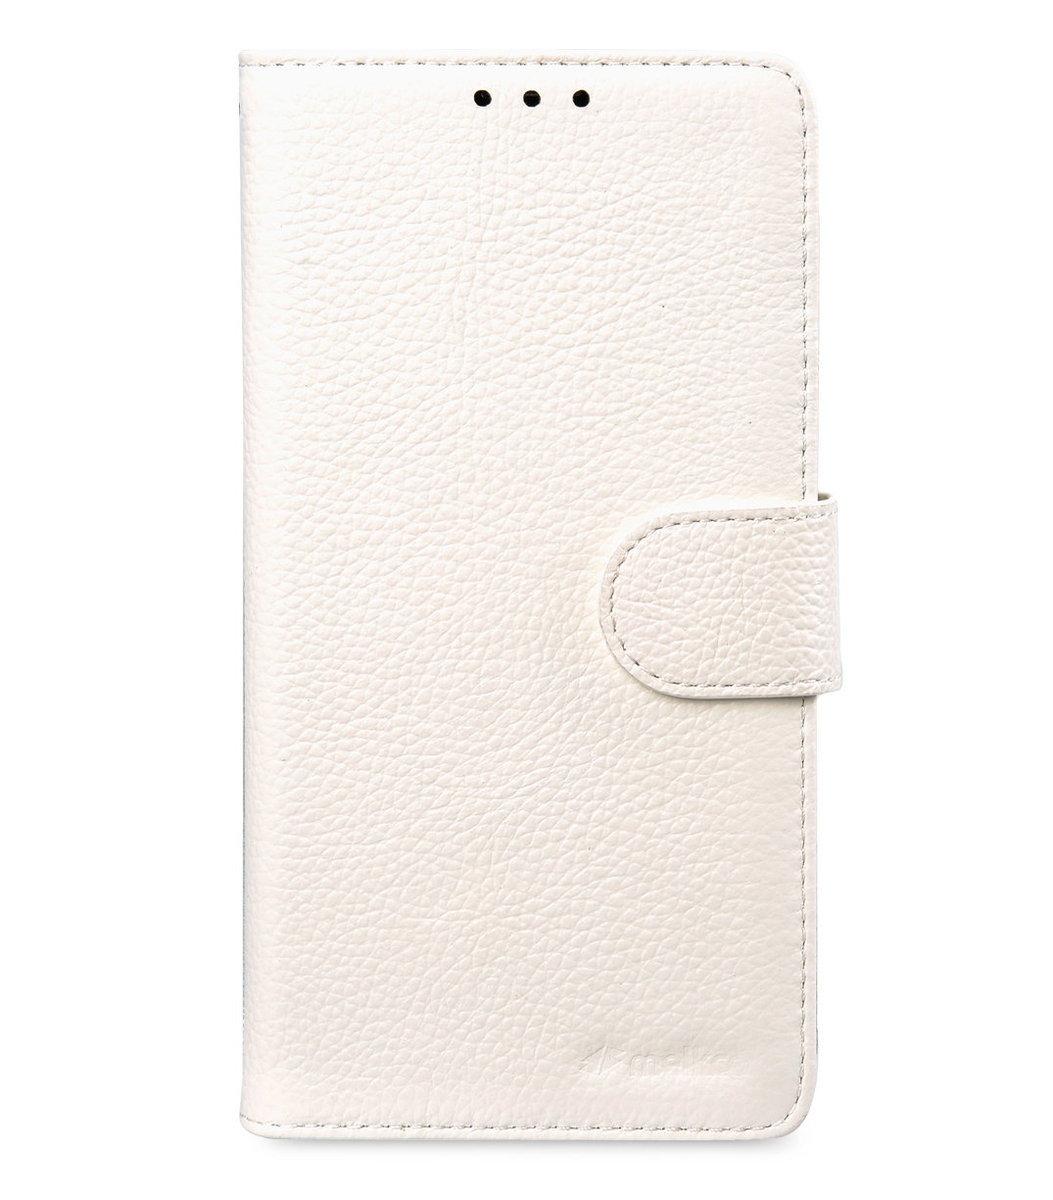 Samsung Galaxy Note 5 Wallet Book Type 高級真皮革手機套 - 白色荔枝紋